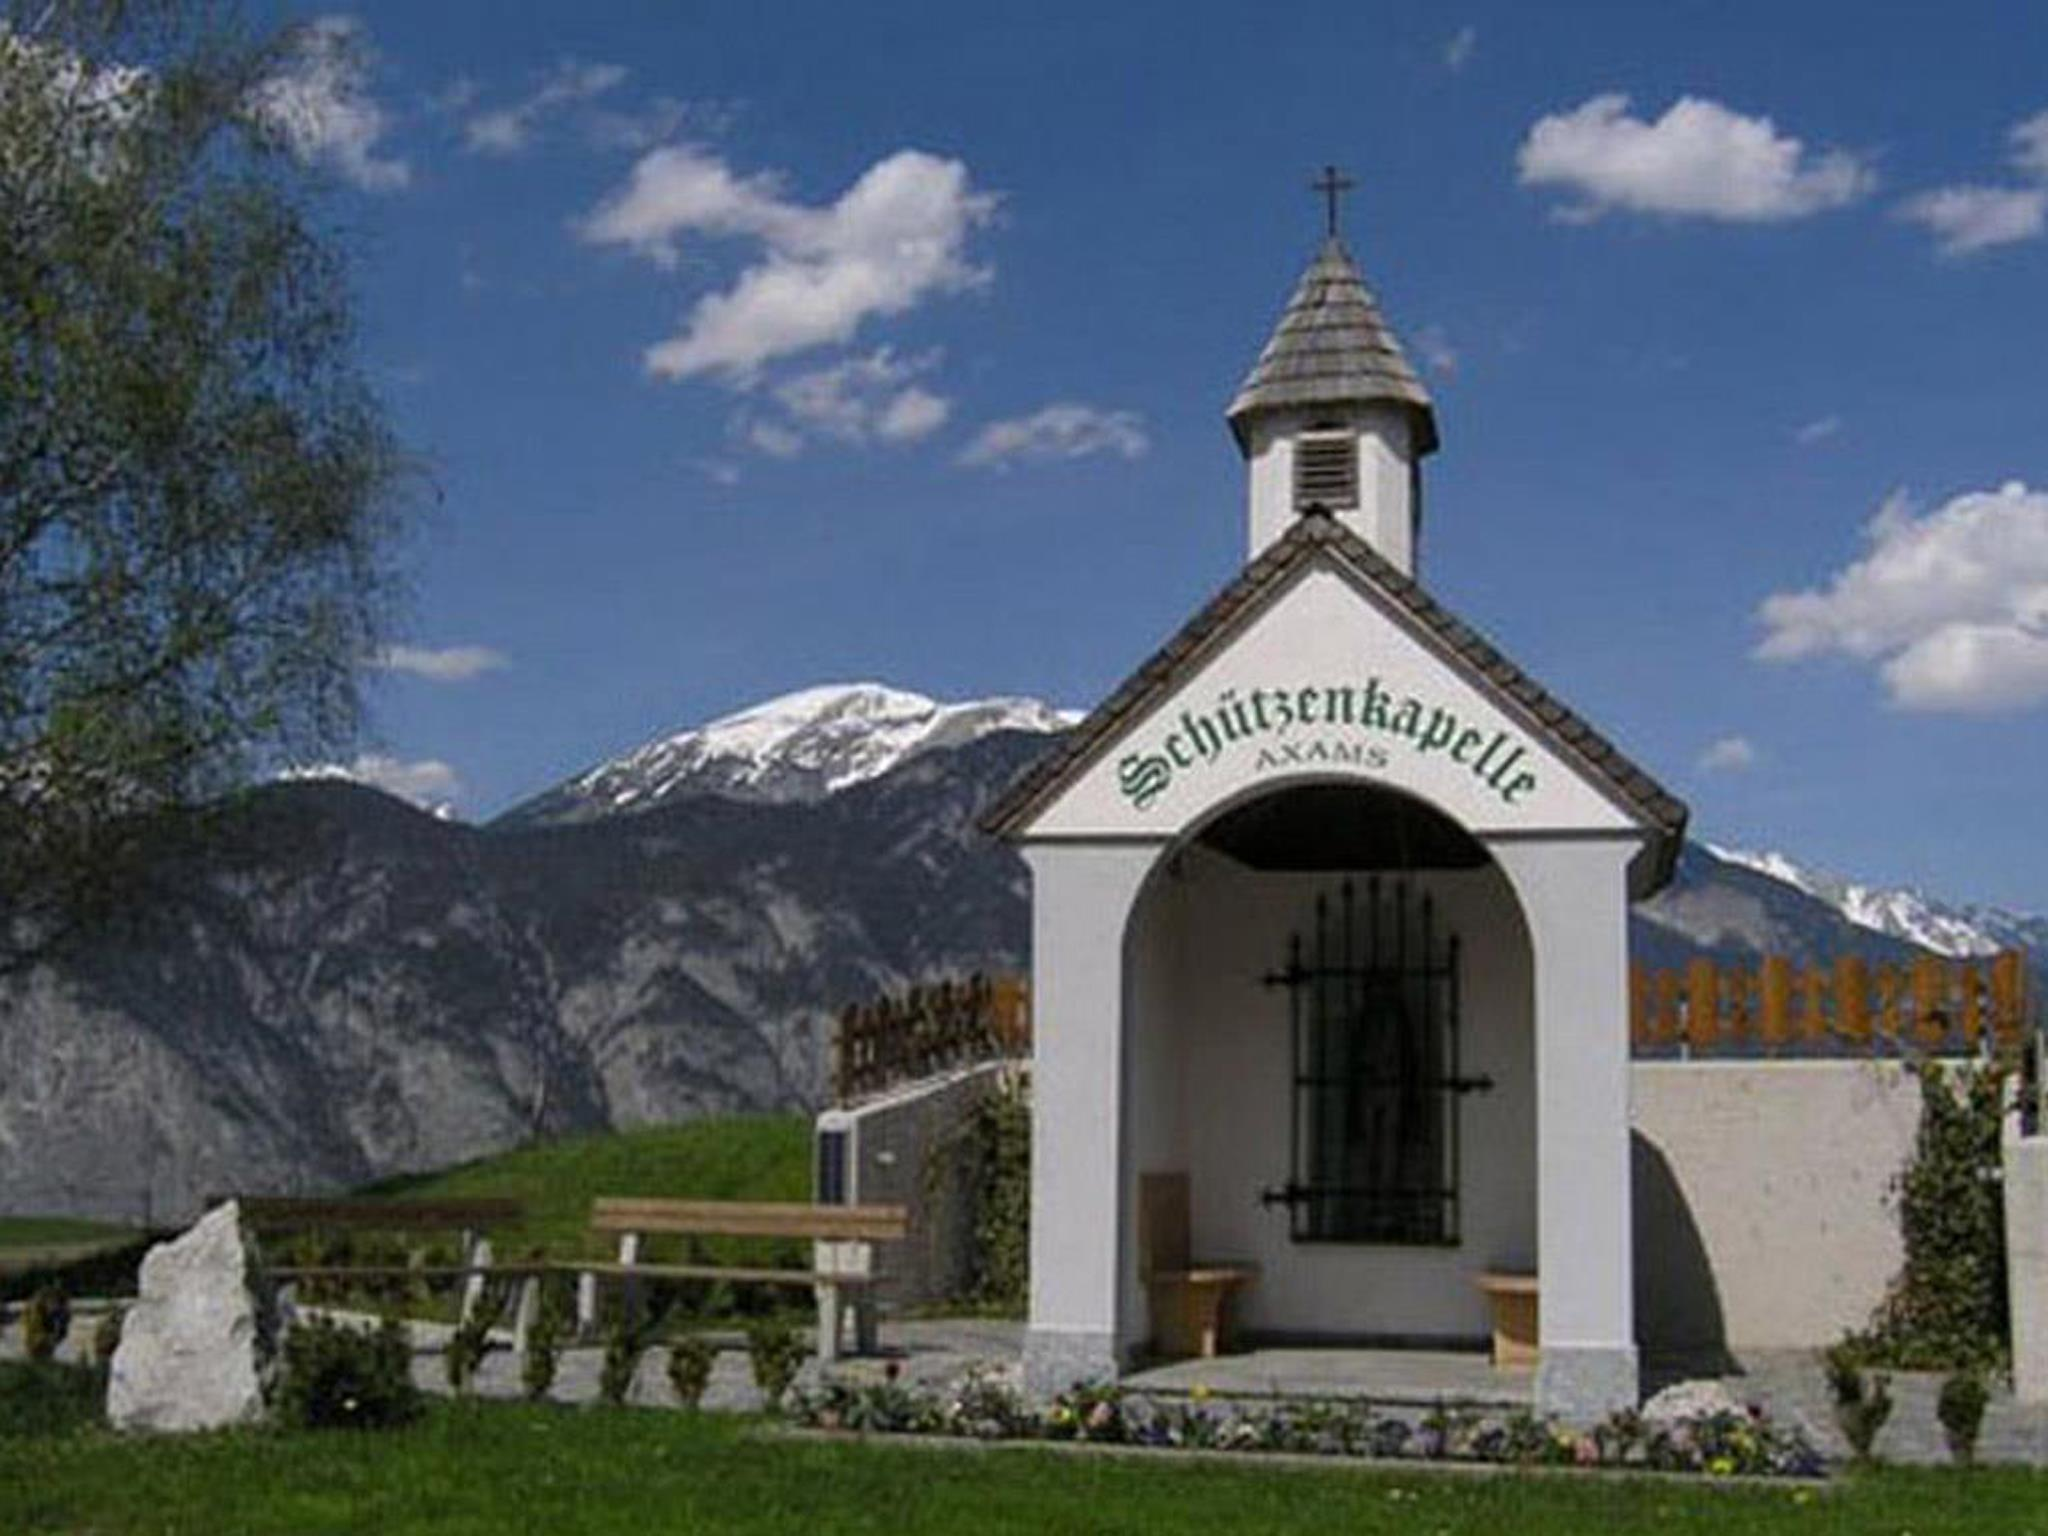 Schützenkapelle - Kapelle zum gegeißelten Christus